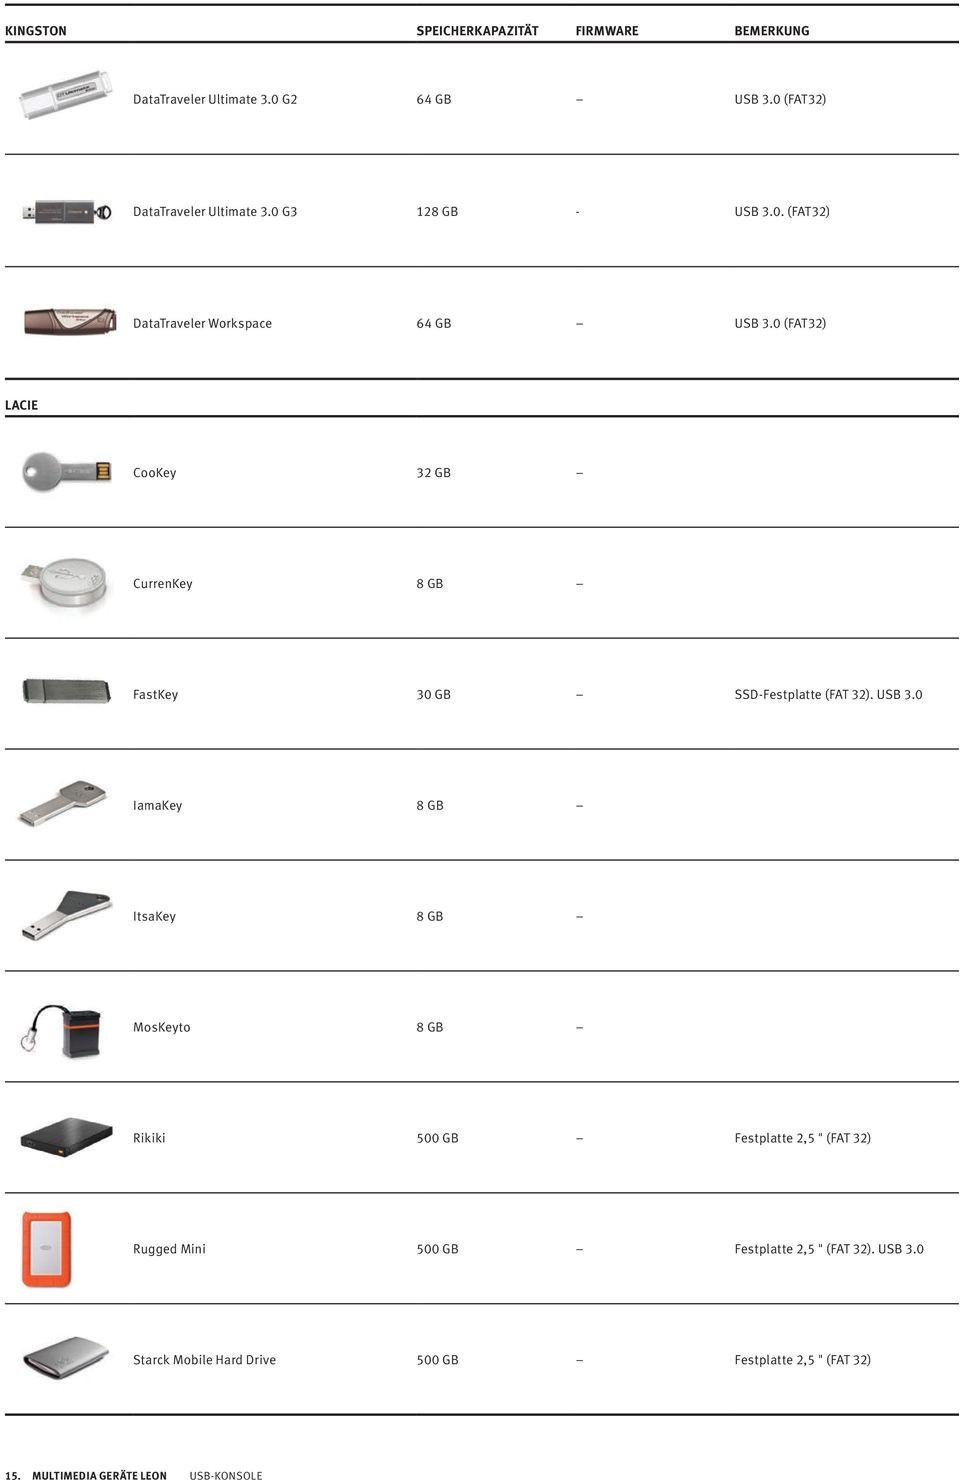 Creative Zen X-fi Sd Card Compatibility Leon Multimedia Technology to Enjoy Pdf Kostenfreier Download